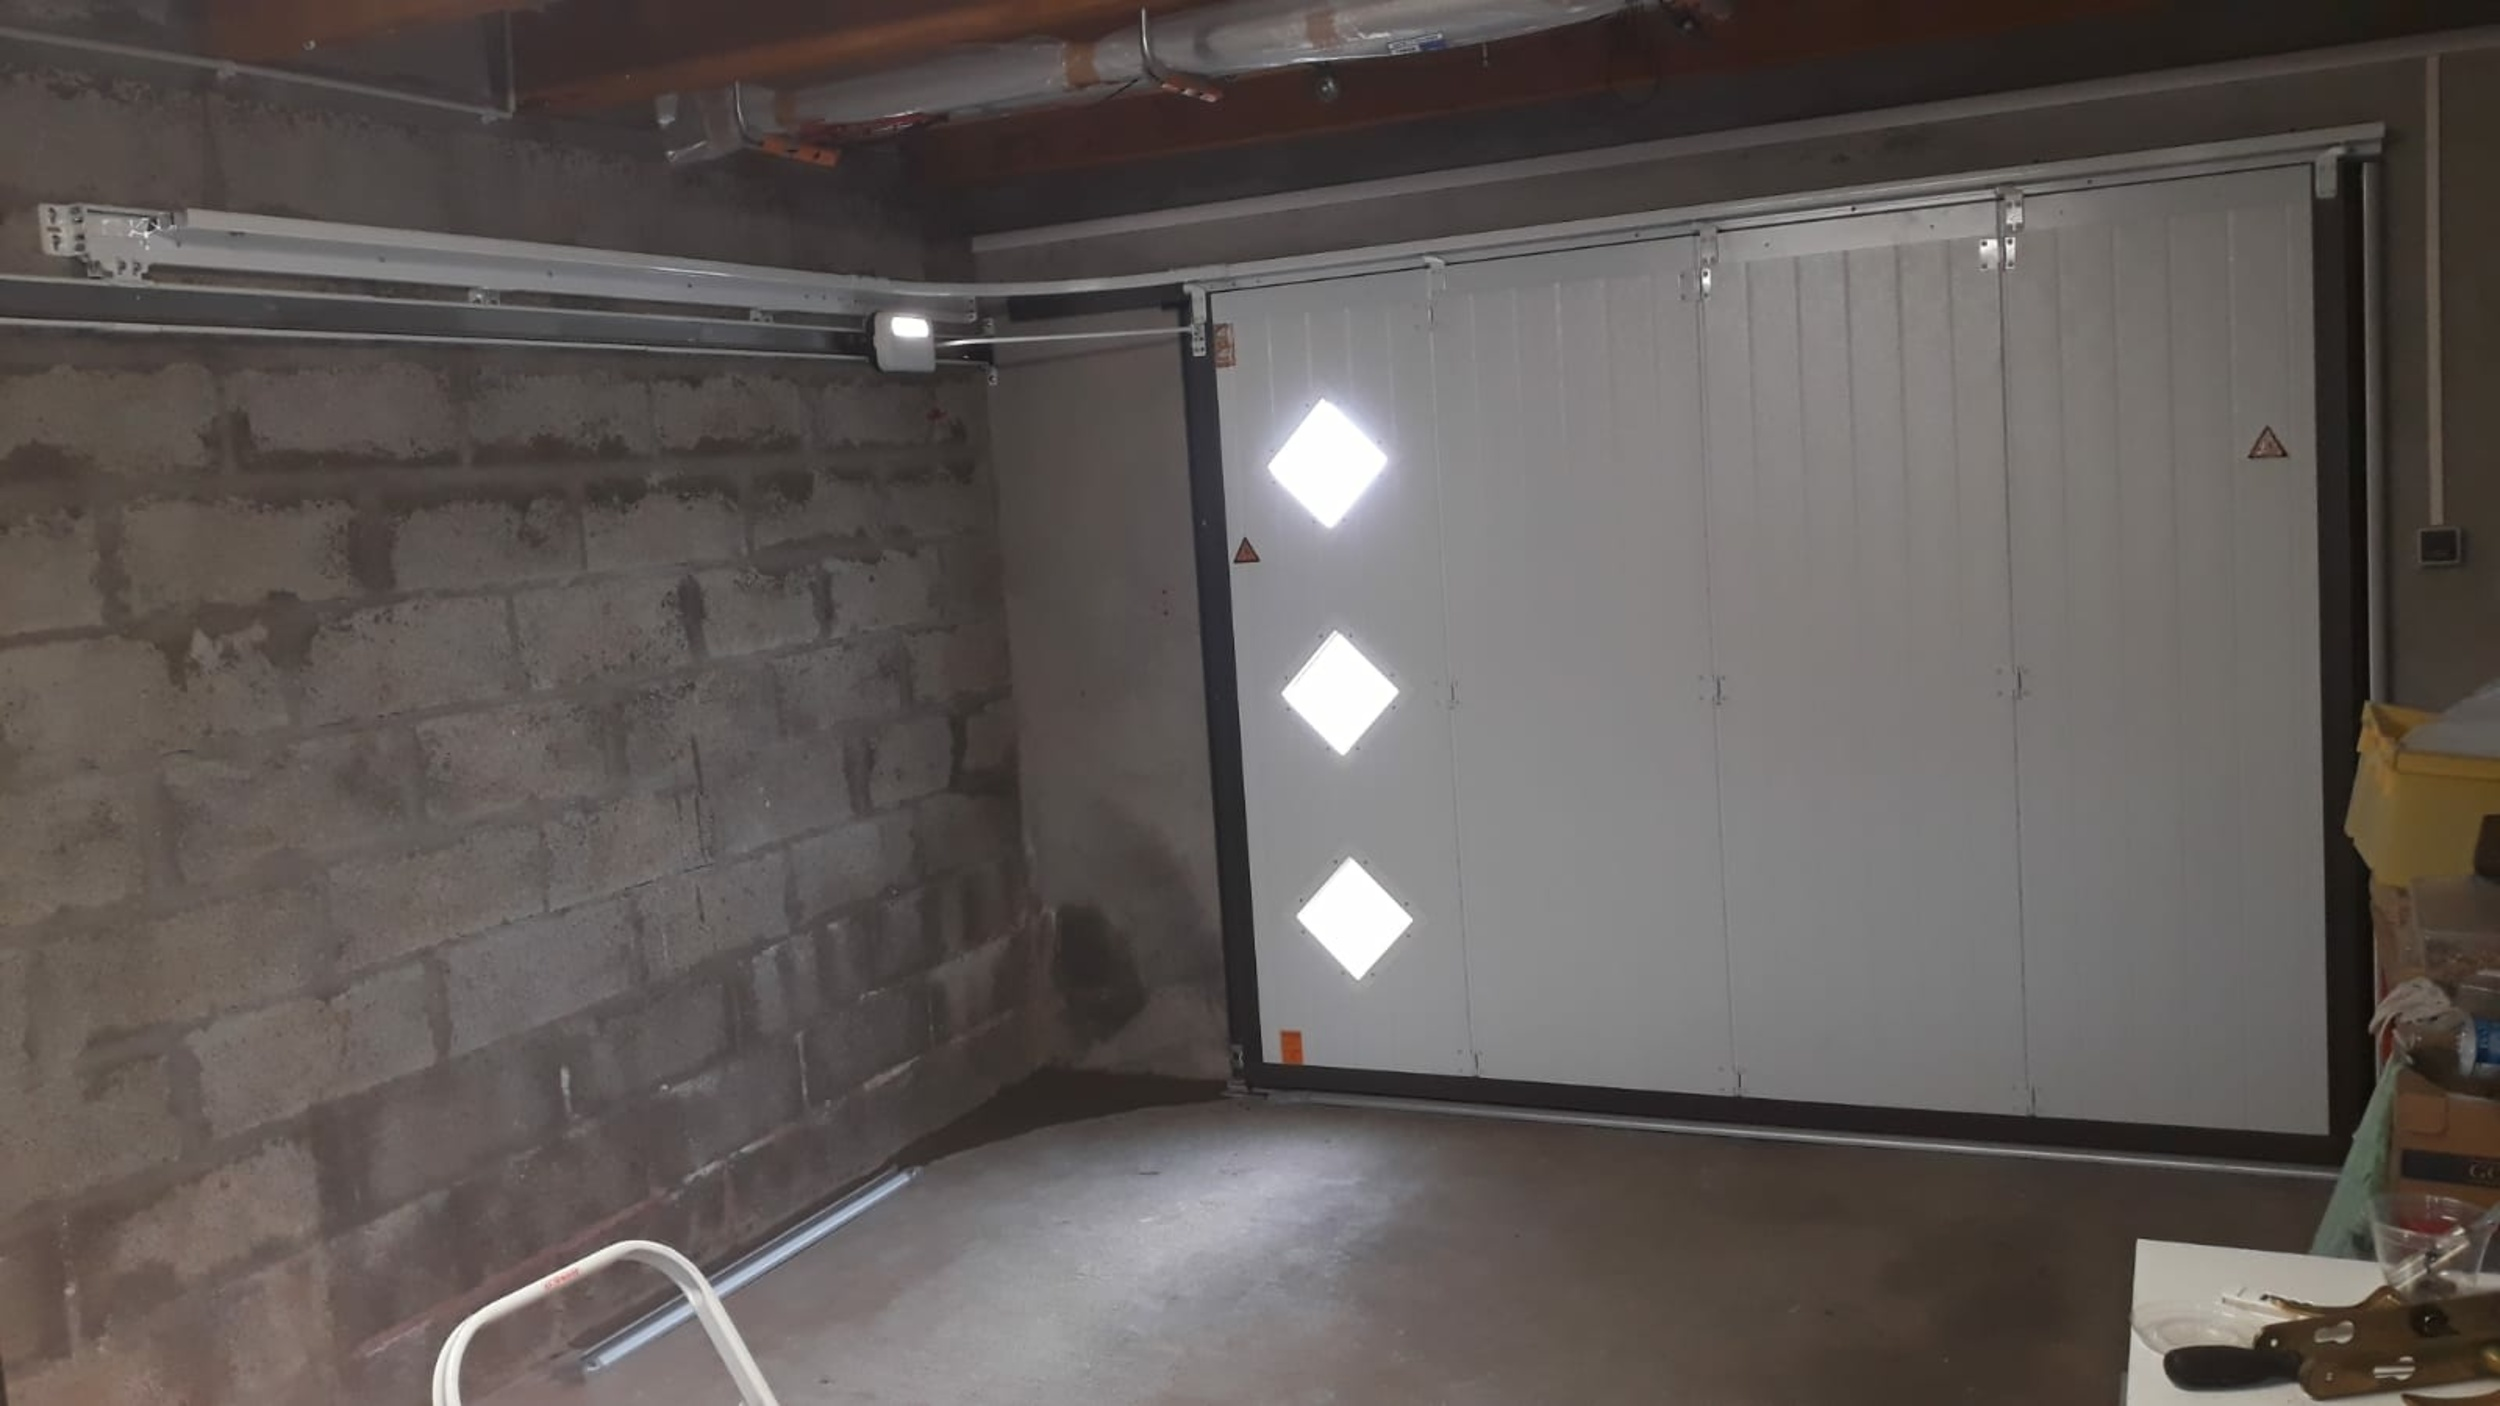 Porte de garage latérale motorisée - Lanester